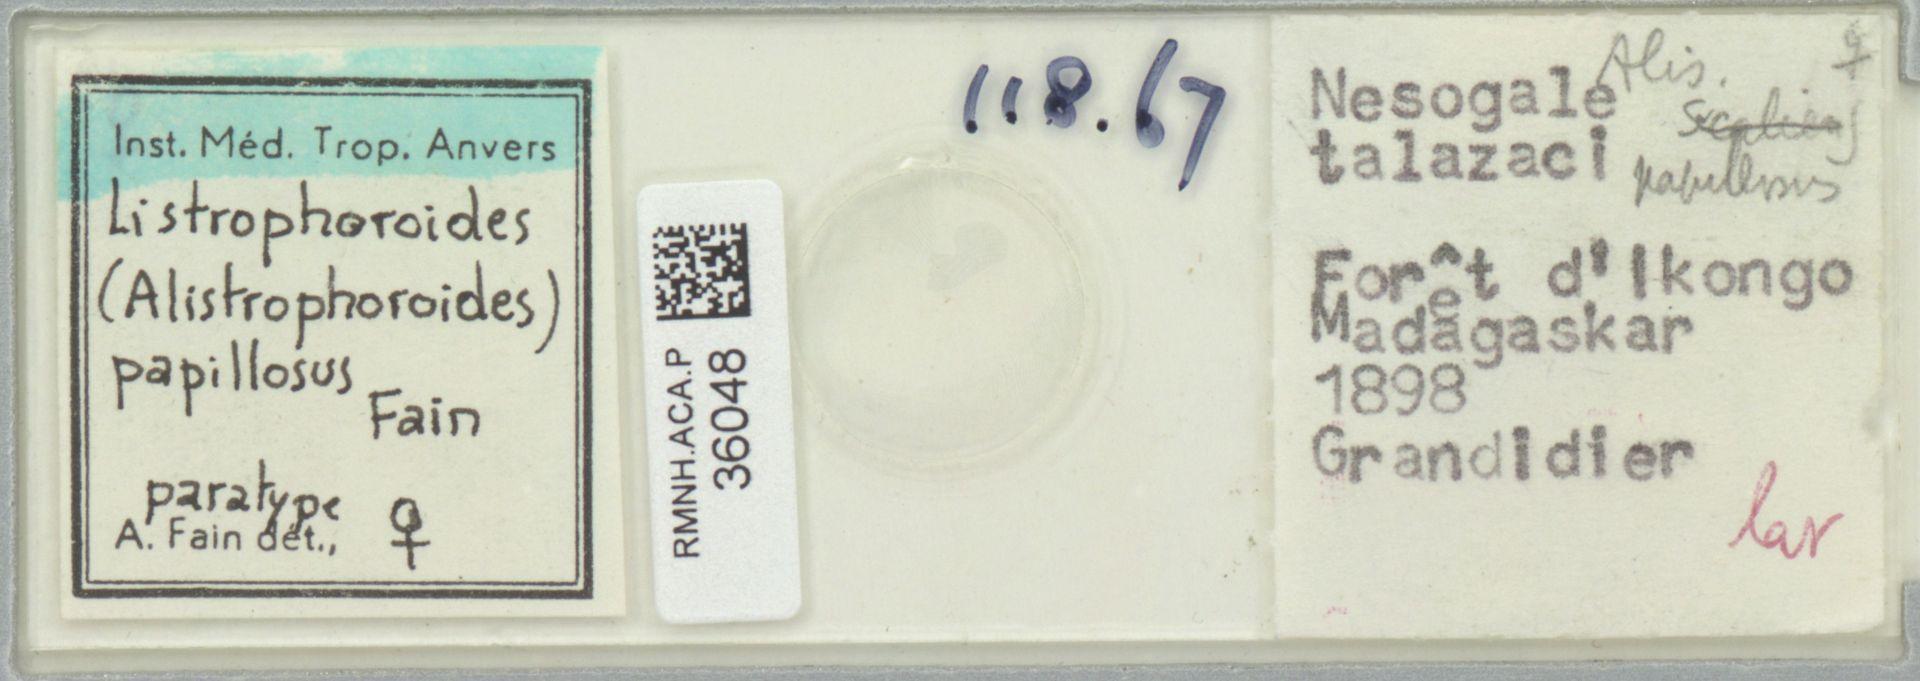 RMNH.ACA.P.36048 | Listrophoroides (Alistrophoroides) papillosus Fain